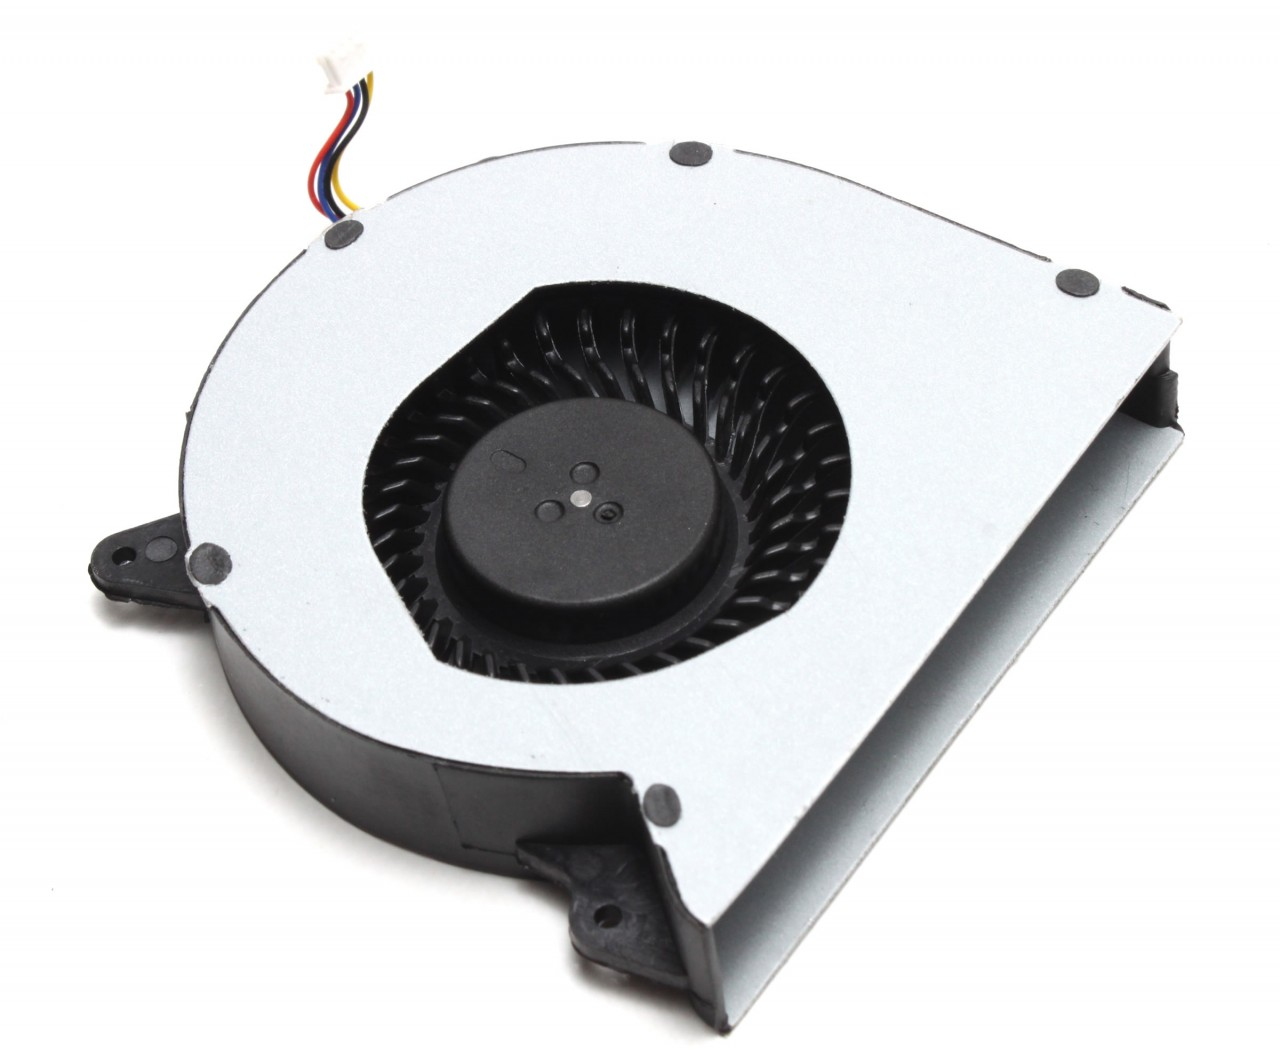 Cooler procesor CPU laptop Asus Rog G750JW imagine powerlaptop.ro 2021